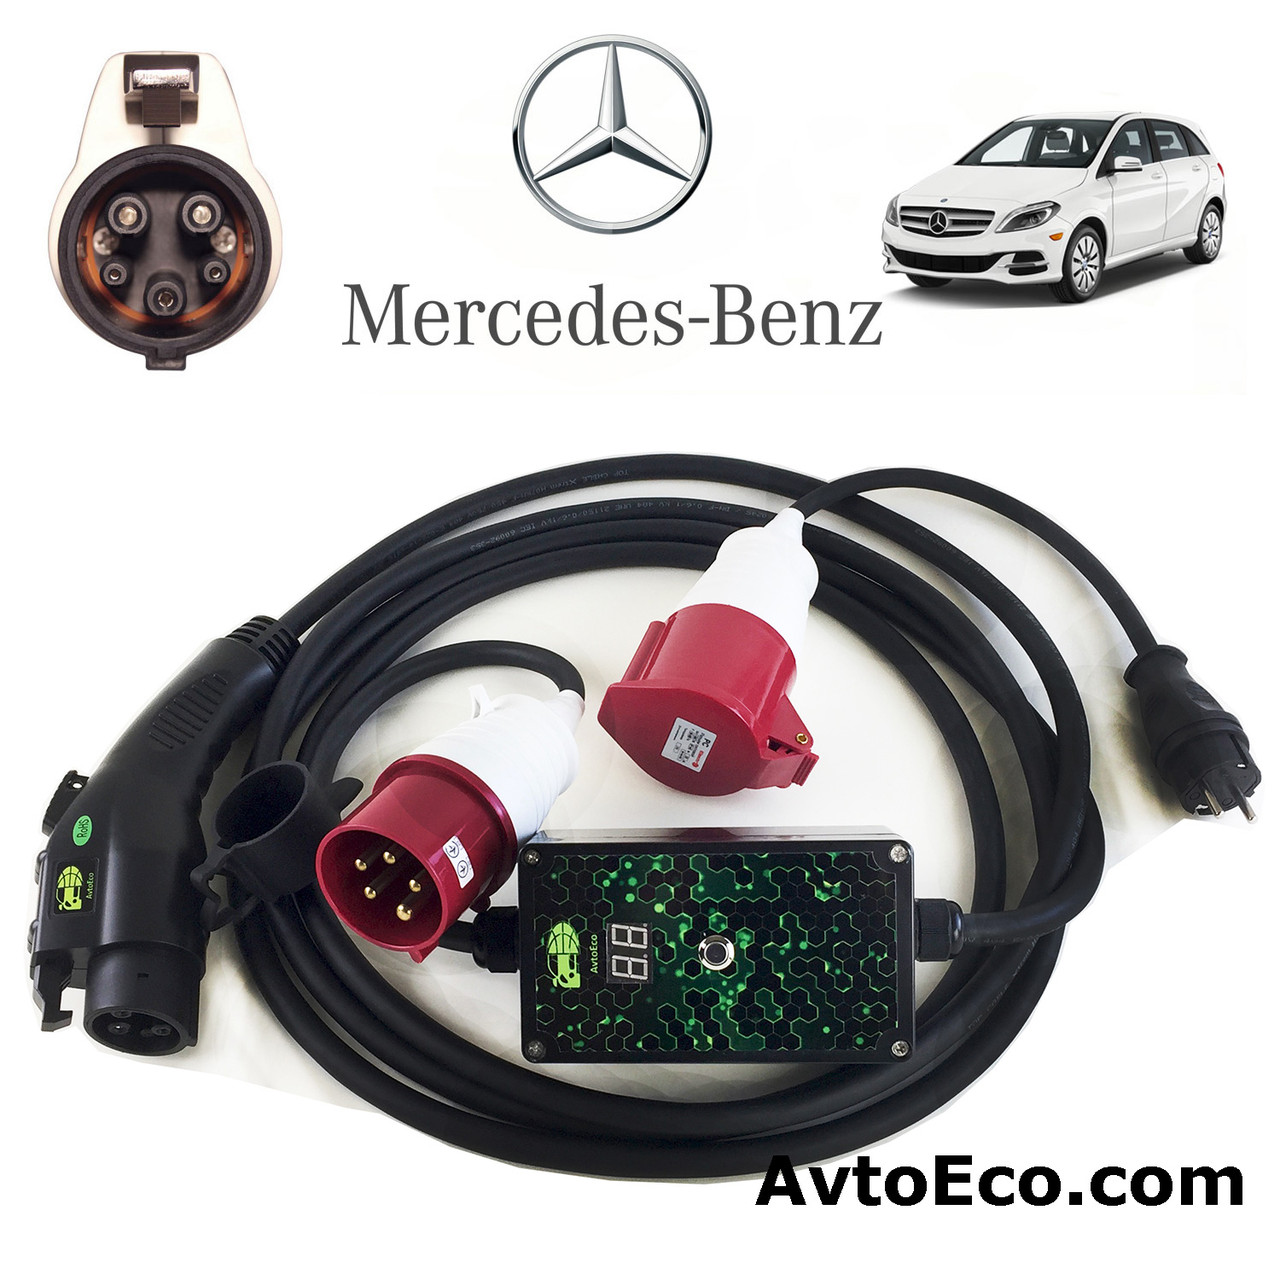 Зарядное устройство для электромобиля Mercedes-Benz B-class Electric Drive AutoEco J1772-32A-BOX